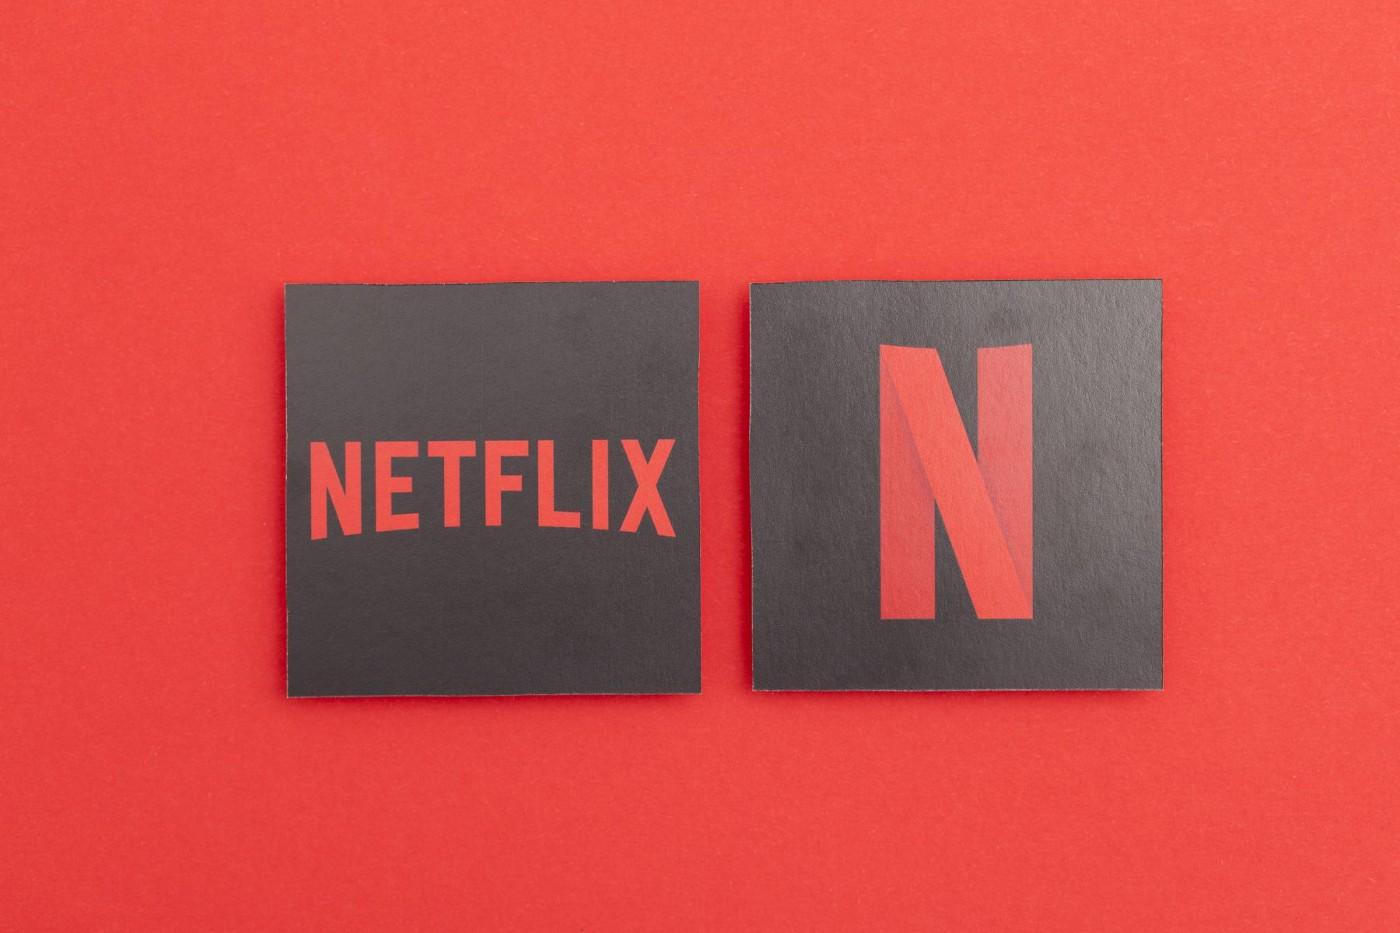 Netflix在美國訂戶超越主要有線電視,但要取代恐怕還言之過早?